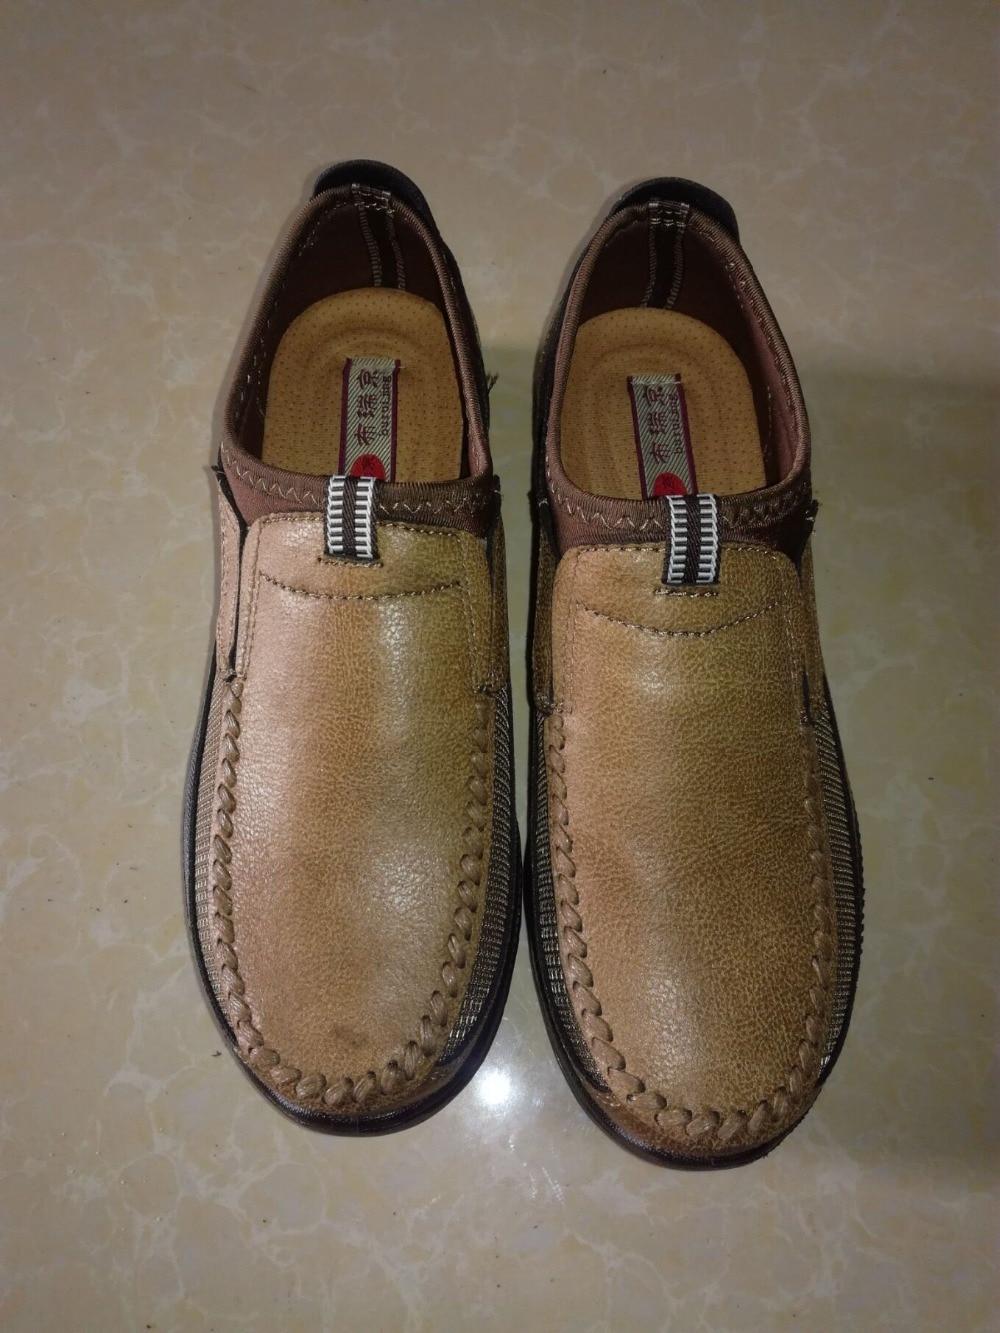 HTB1bRdnP7zoK1RjSZFlq6yi4VXaW Luxury Brand Men Casual Shoes Lightweight Breathable Sneakers Male Walking Shoes Fashion Mesh Zapatillas Footwear Big Szie 38-48